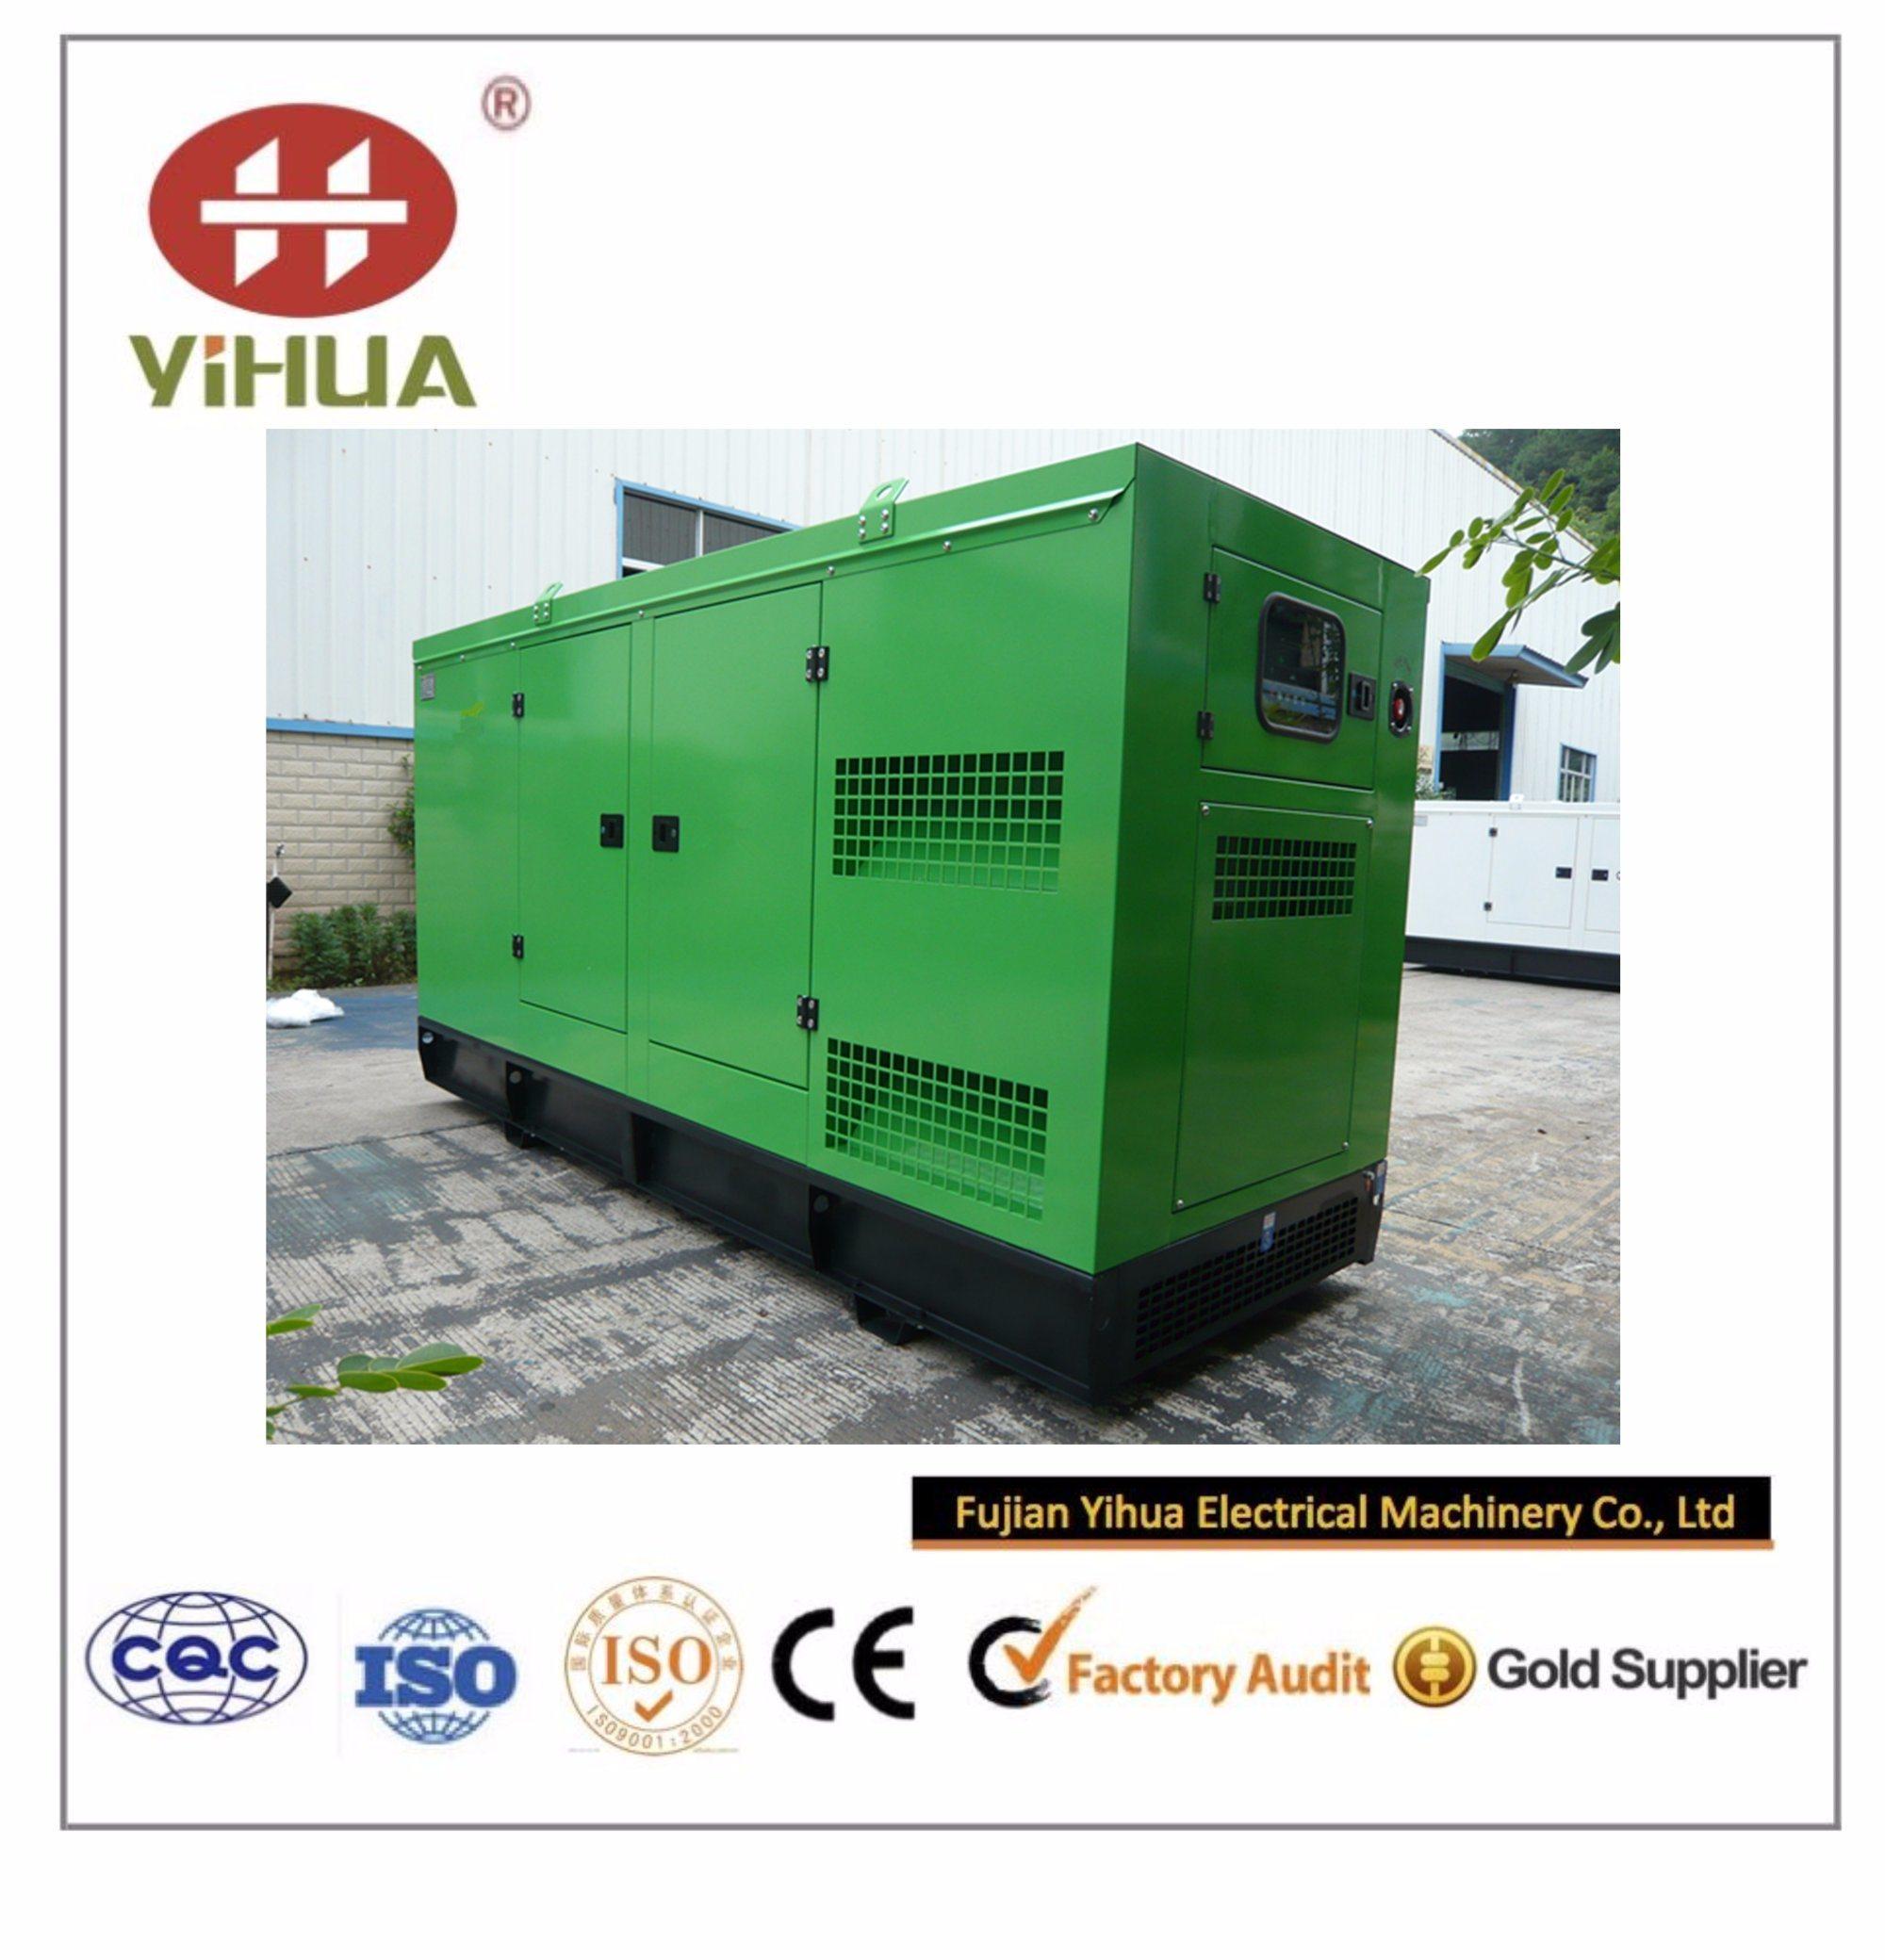 Cummins Power Soundproof Generator with CIQ/Soncap/Ce Certifications (20kVA~250kVA)